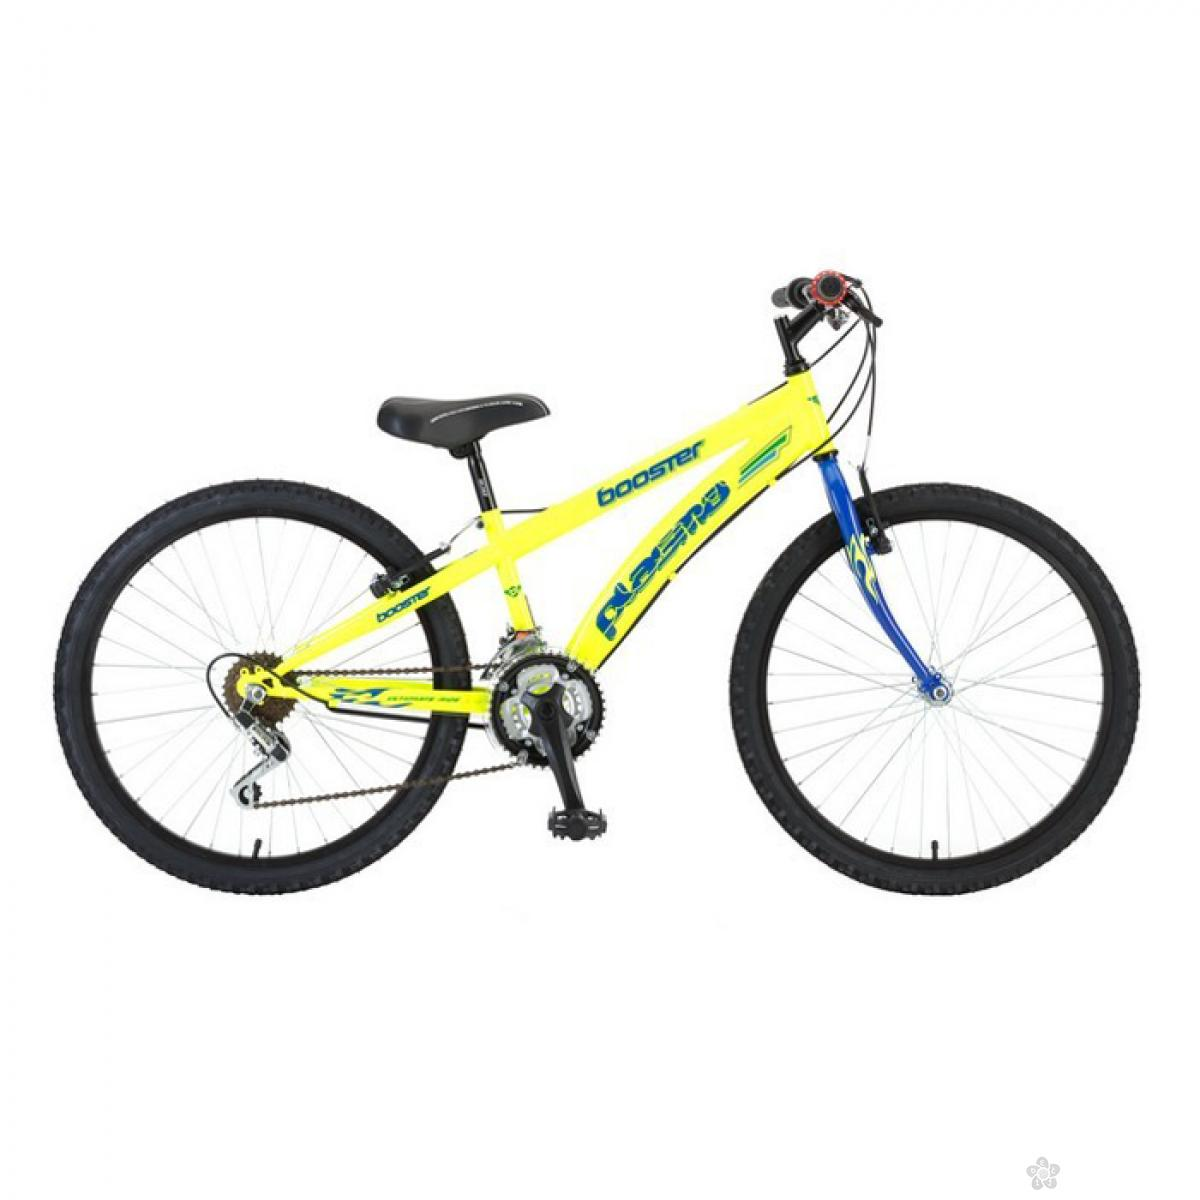 Dečji bicikl booster plasma BIC-0210-Y ŽUTI